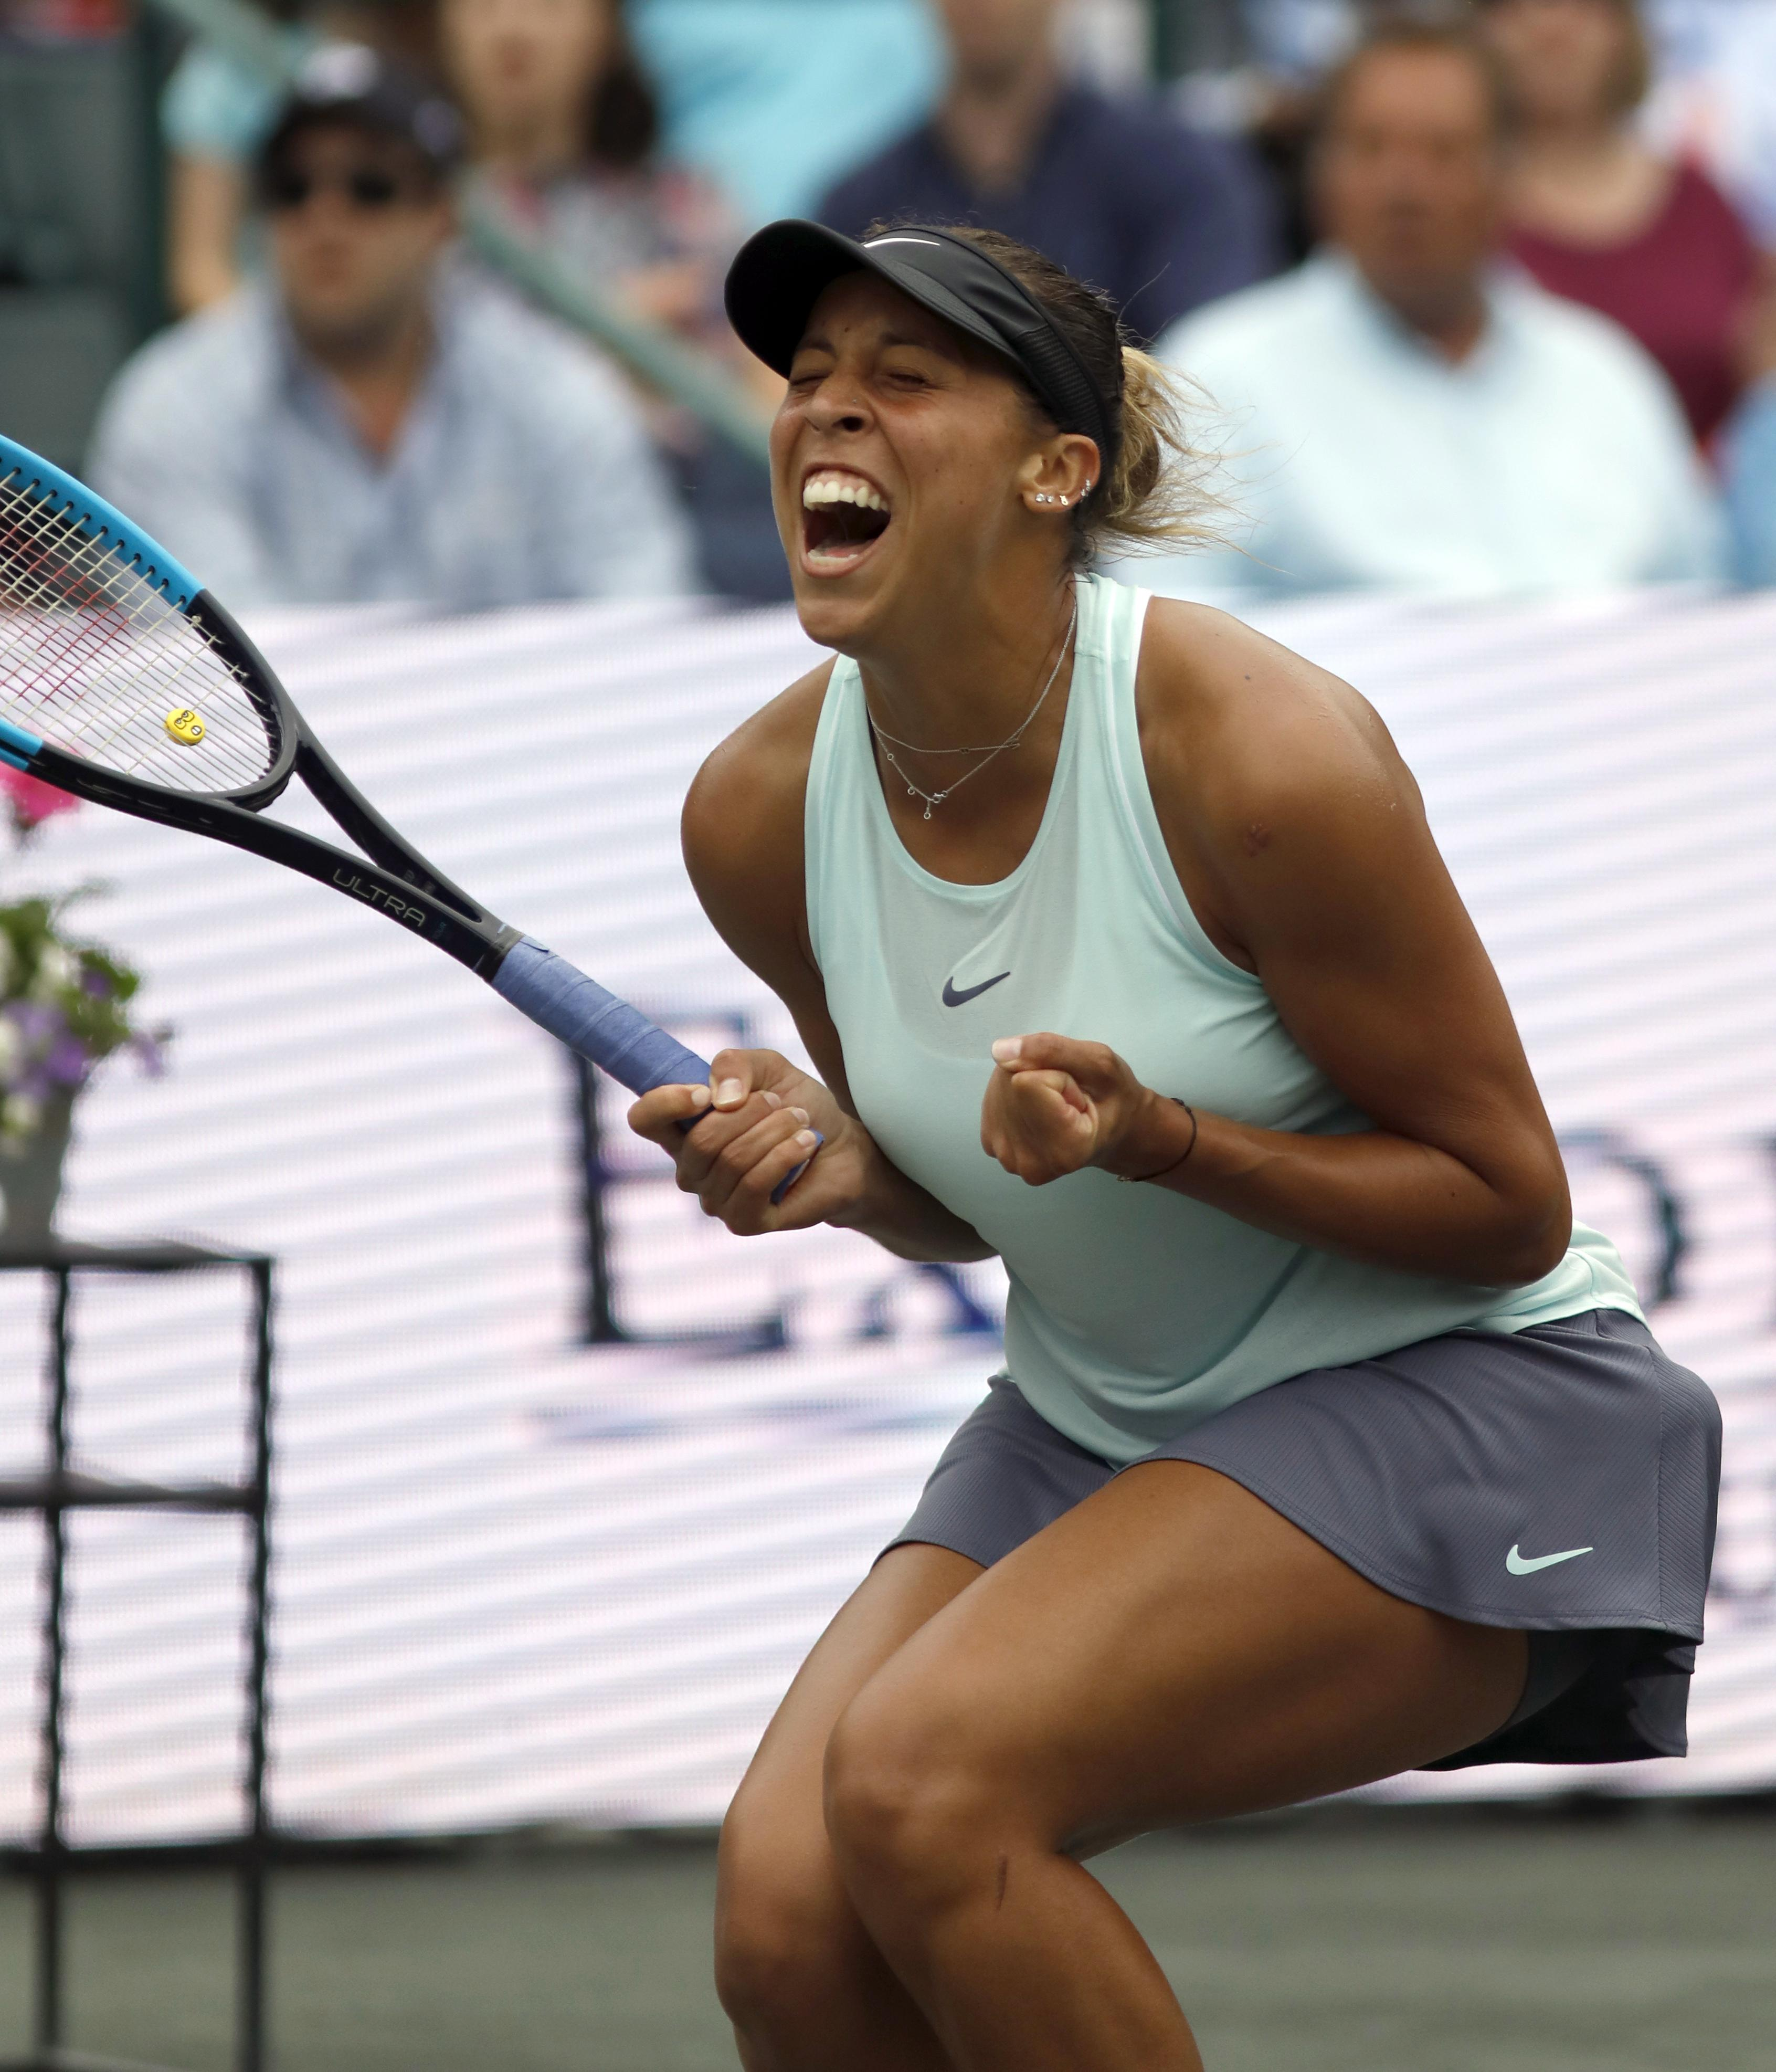 American Madison Keys Overpowers Caroline Wozniacki To Win Volvo Car Open The Spokesman Review